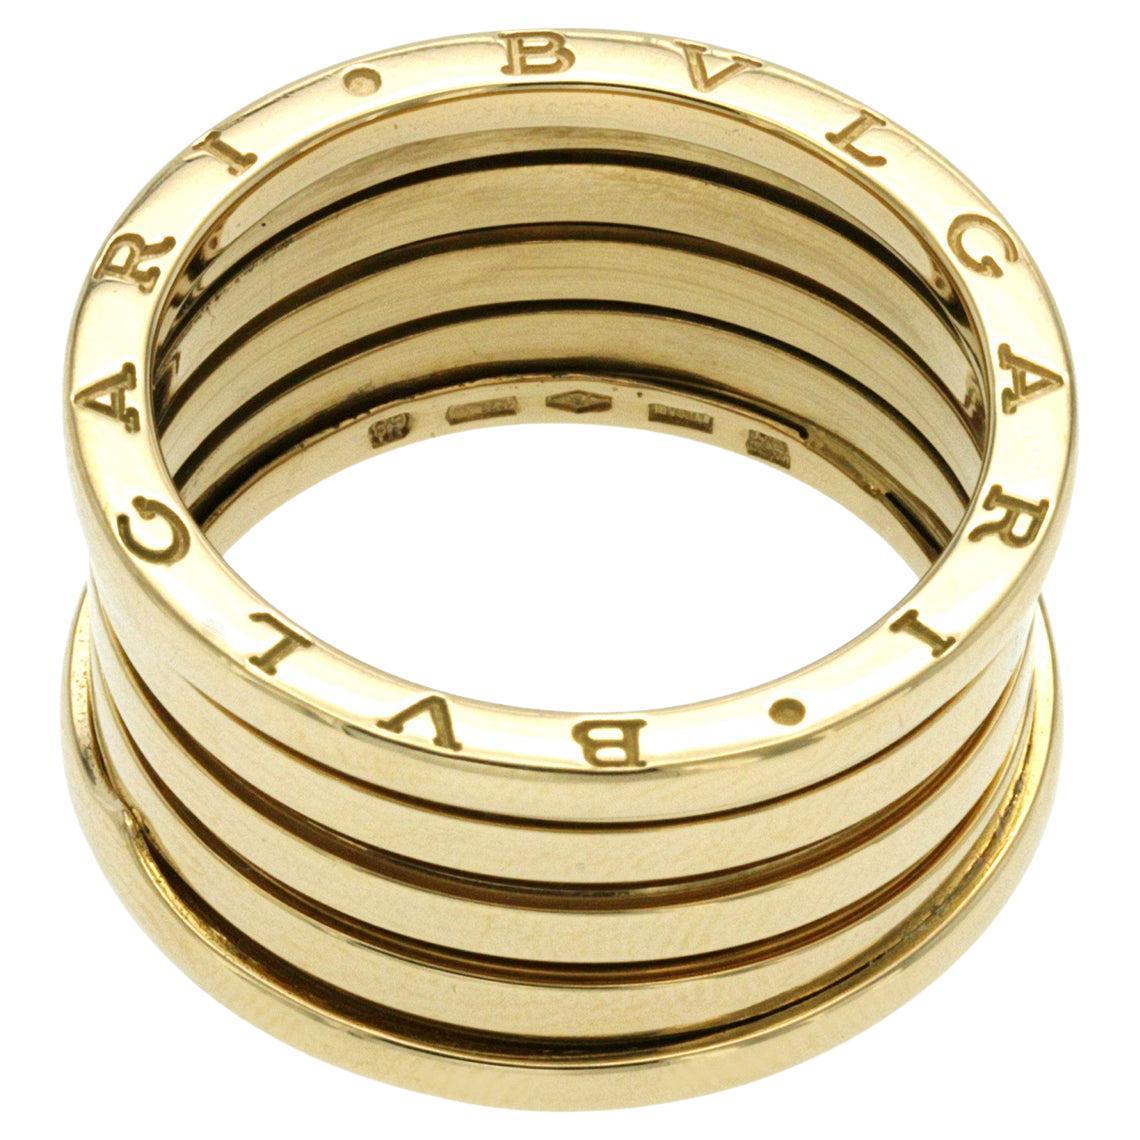 Bulgari Bvlgari B-Zero1 18K Yellow Gold 4 Bands Ring